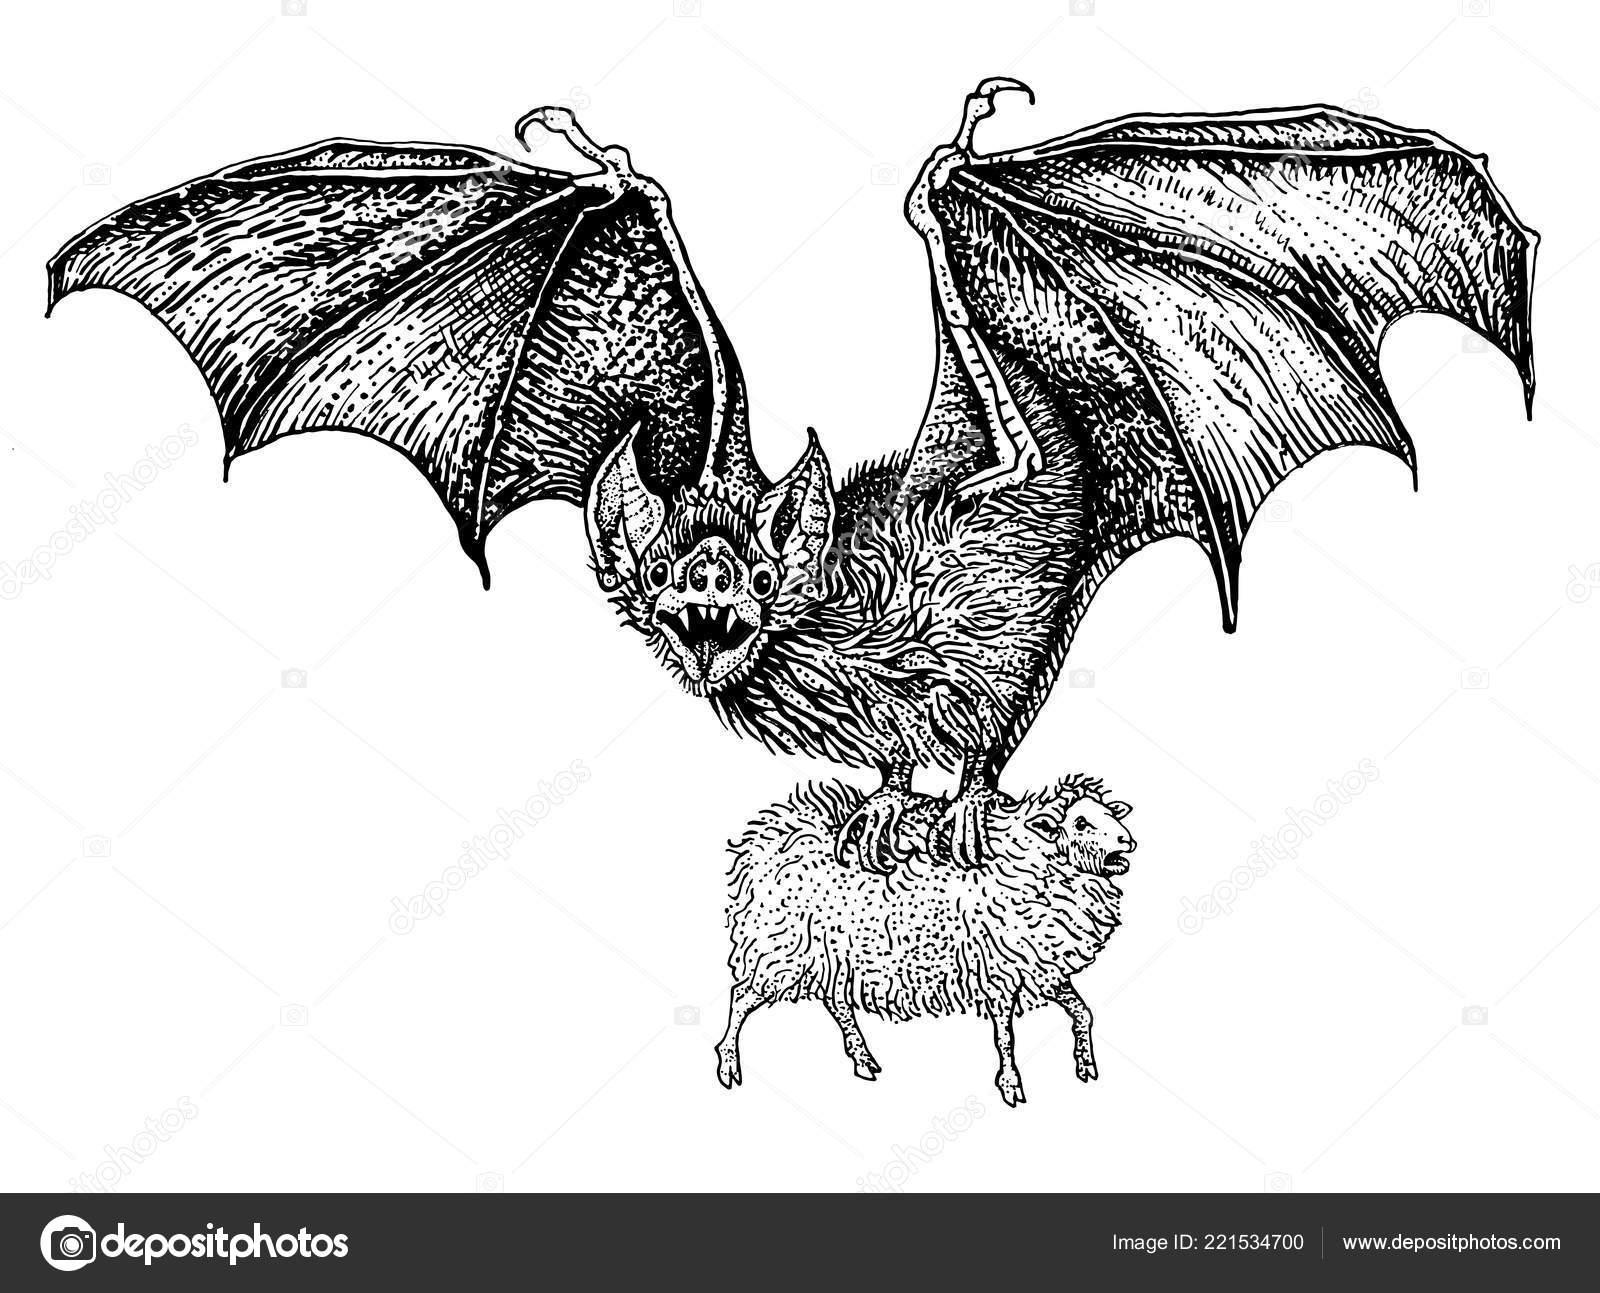 Vuelo De Murciélago Vampiro Gigante Cogió Una Oveja Vintage